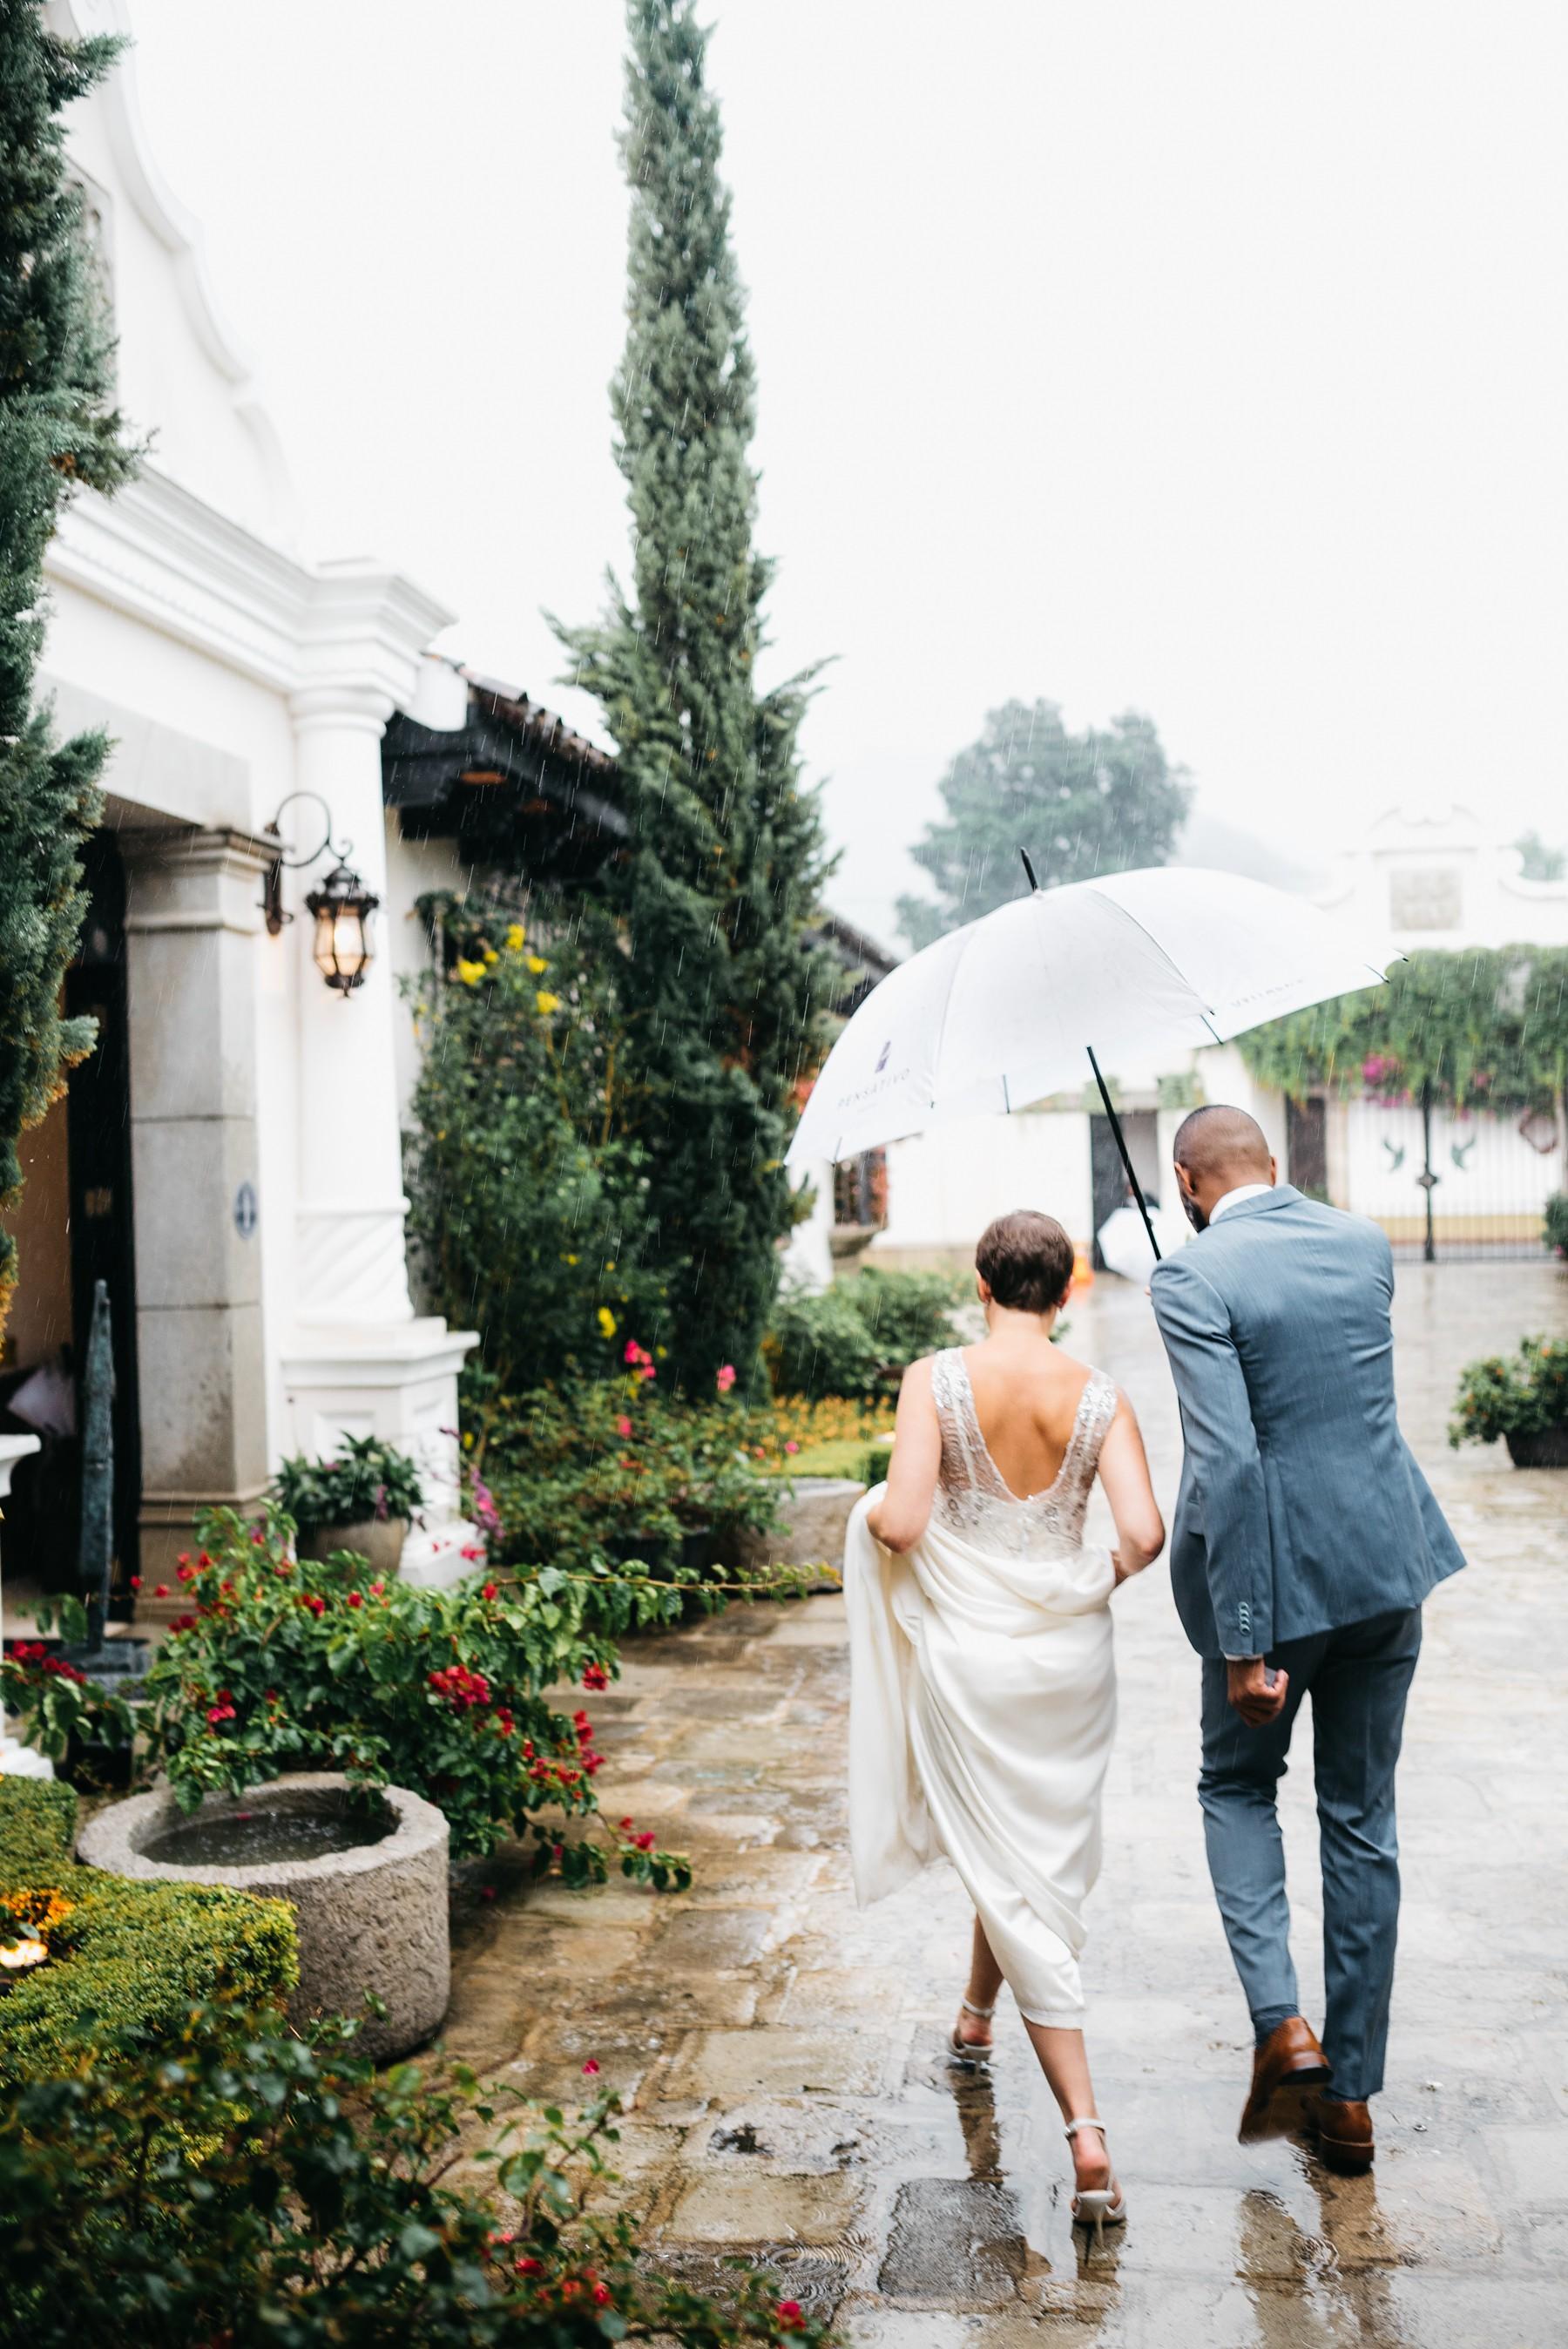 Rainy wedding day antigua guatemala